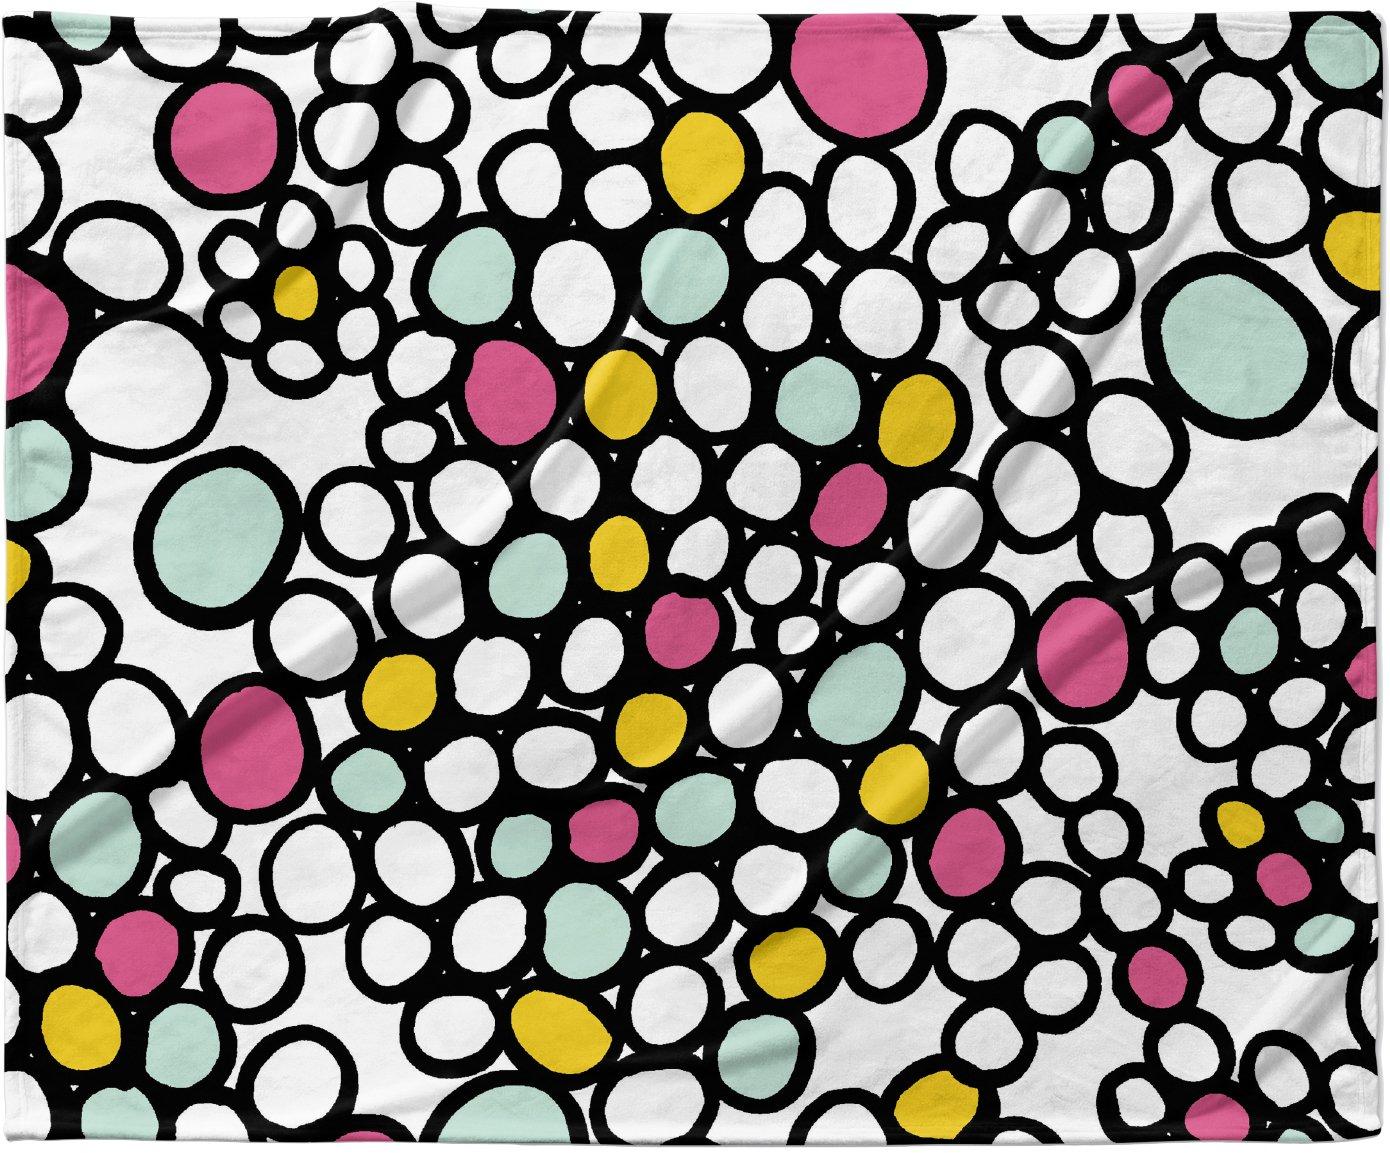 KESS InHouse Emine Ortega 'Pebbles Pink' Fleece Baby Blanket, 40' x 30'